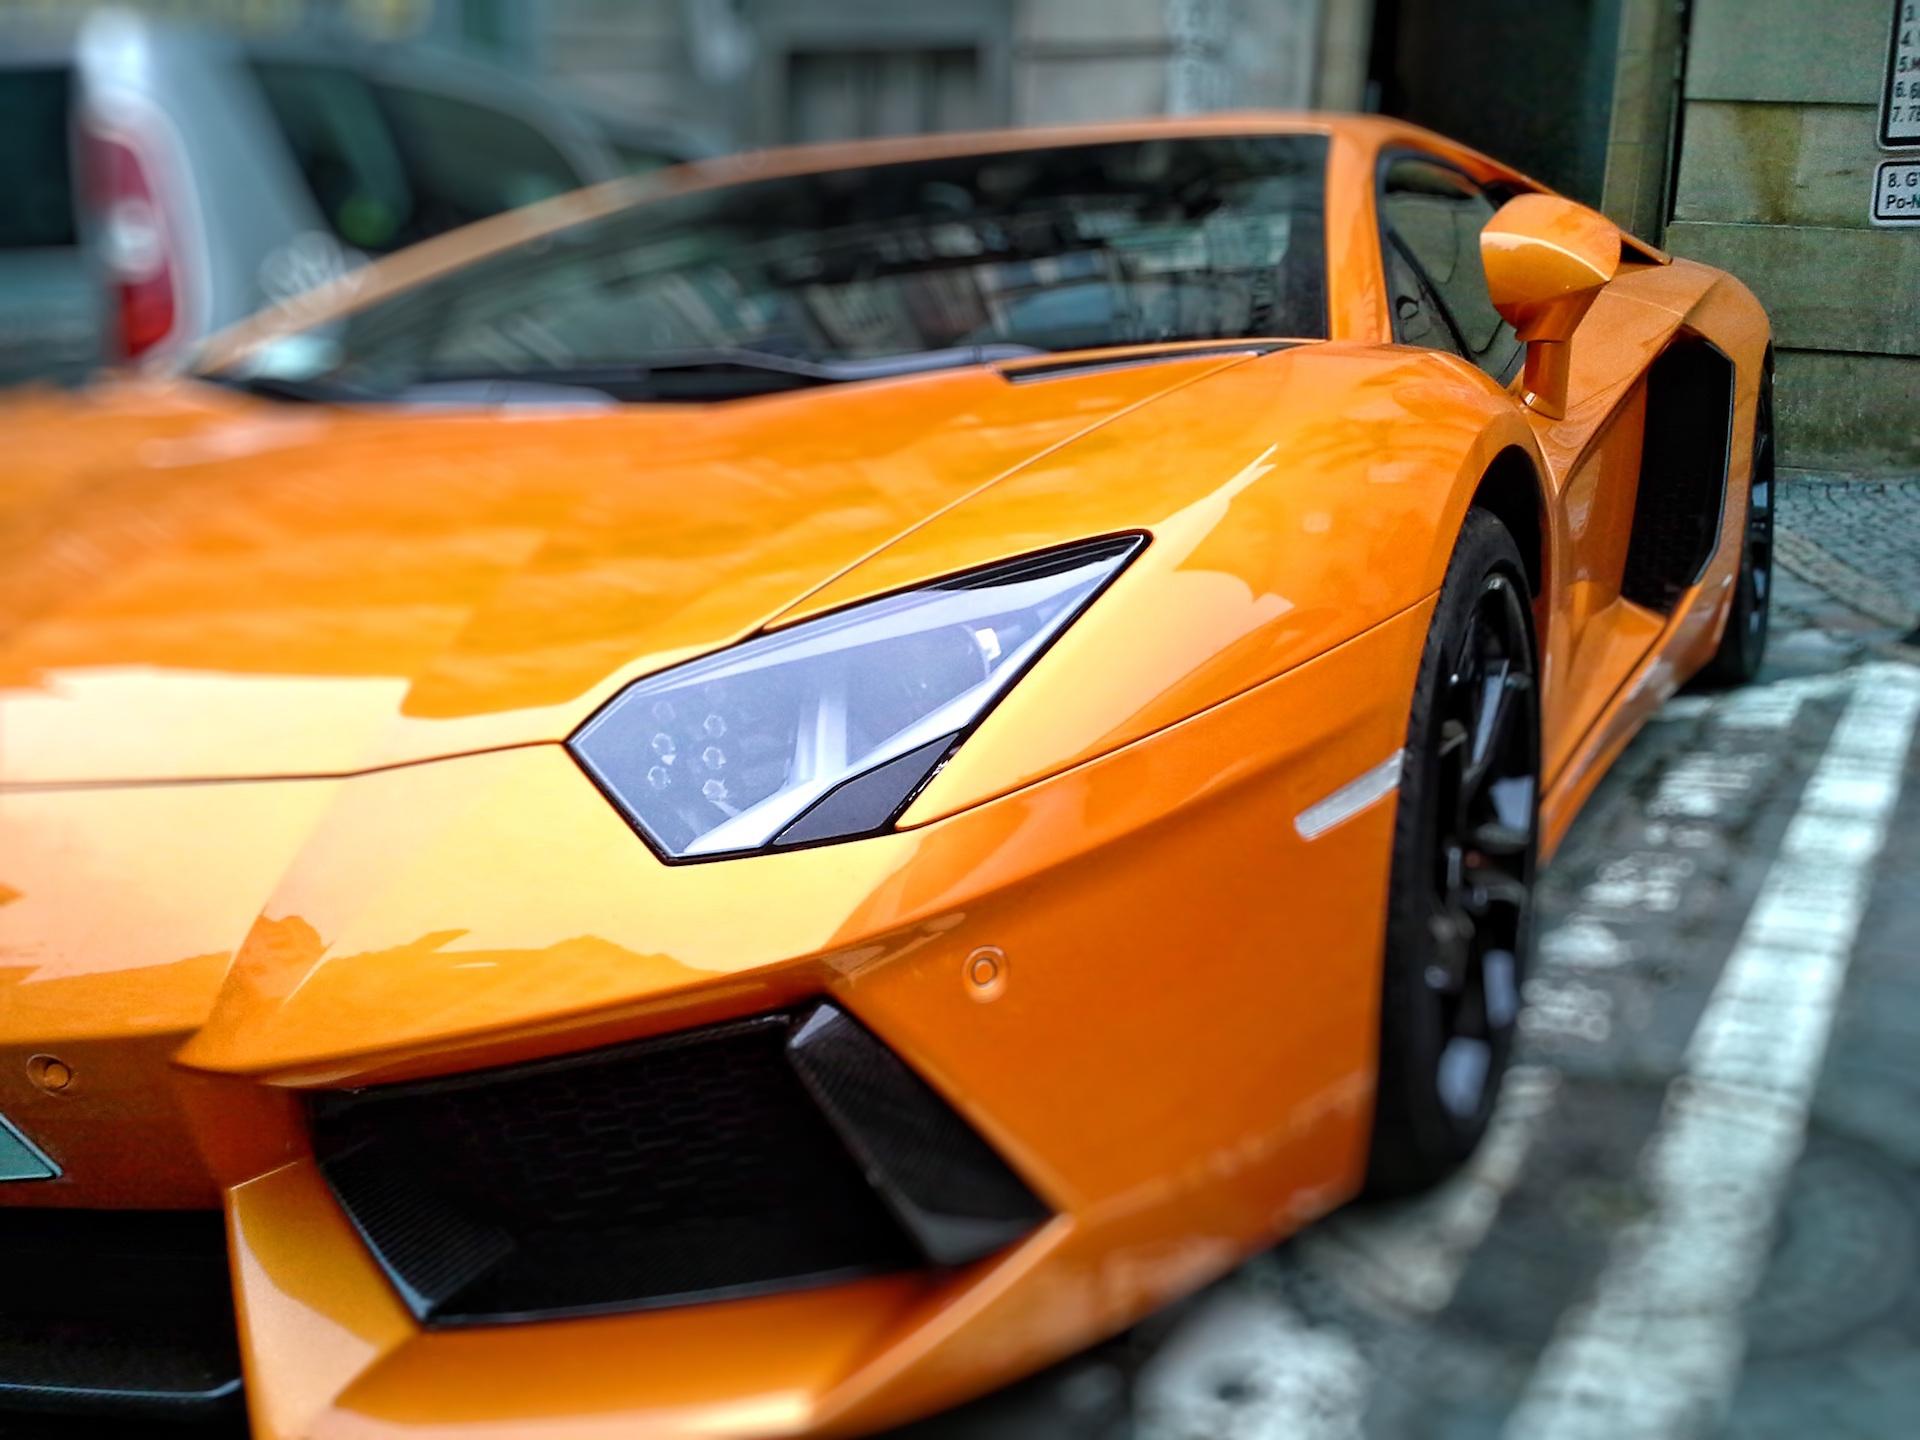 voiture, Lamborghini, luxe, sport, Orange - Fonds d'écran HD - Professor-falken.com